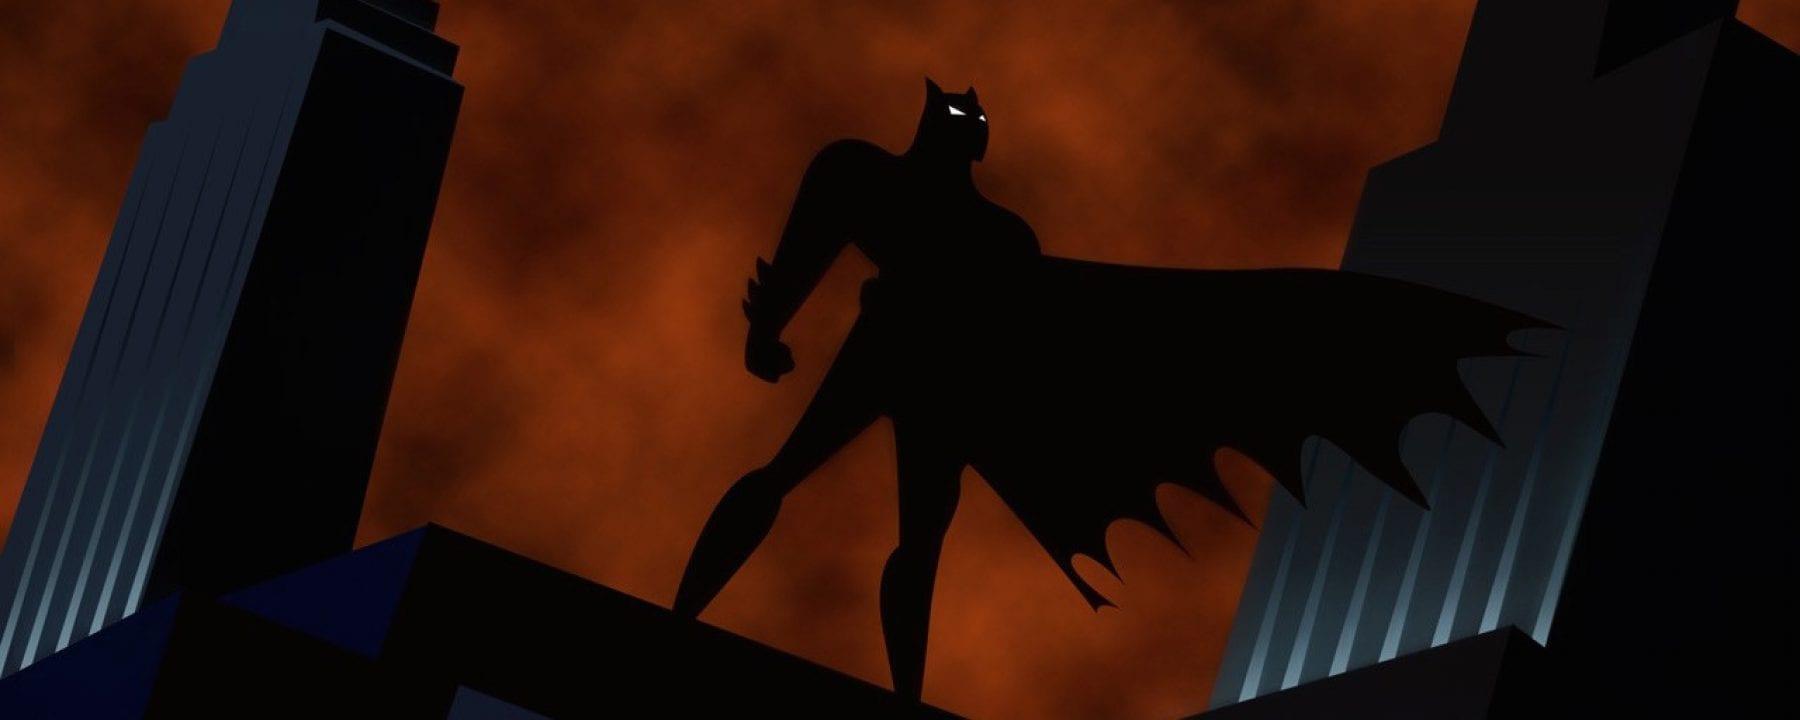 cropped-batman-dessin-animc3a9-review-my-geek-actu1.jpg